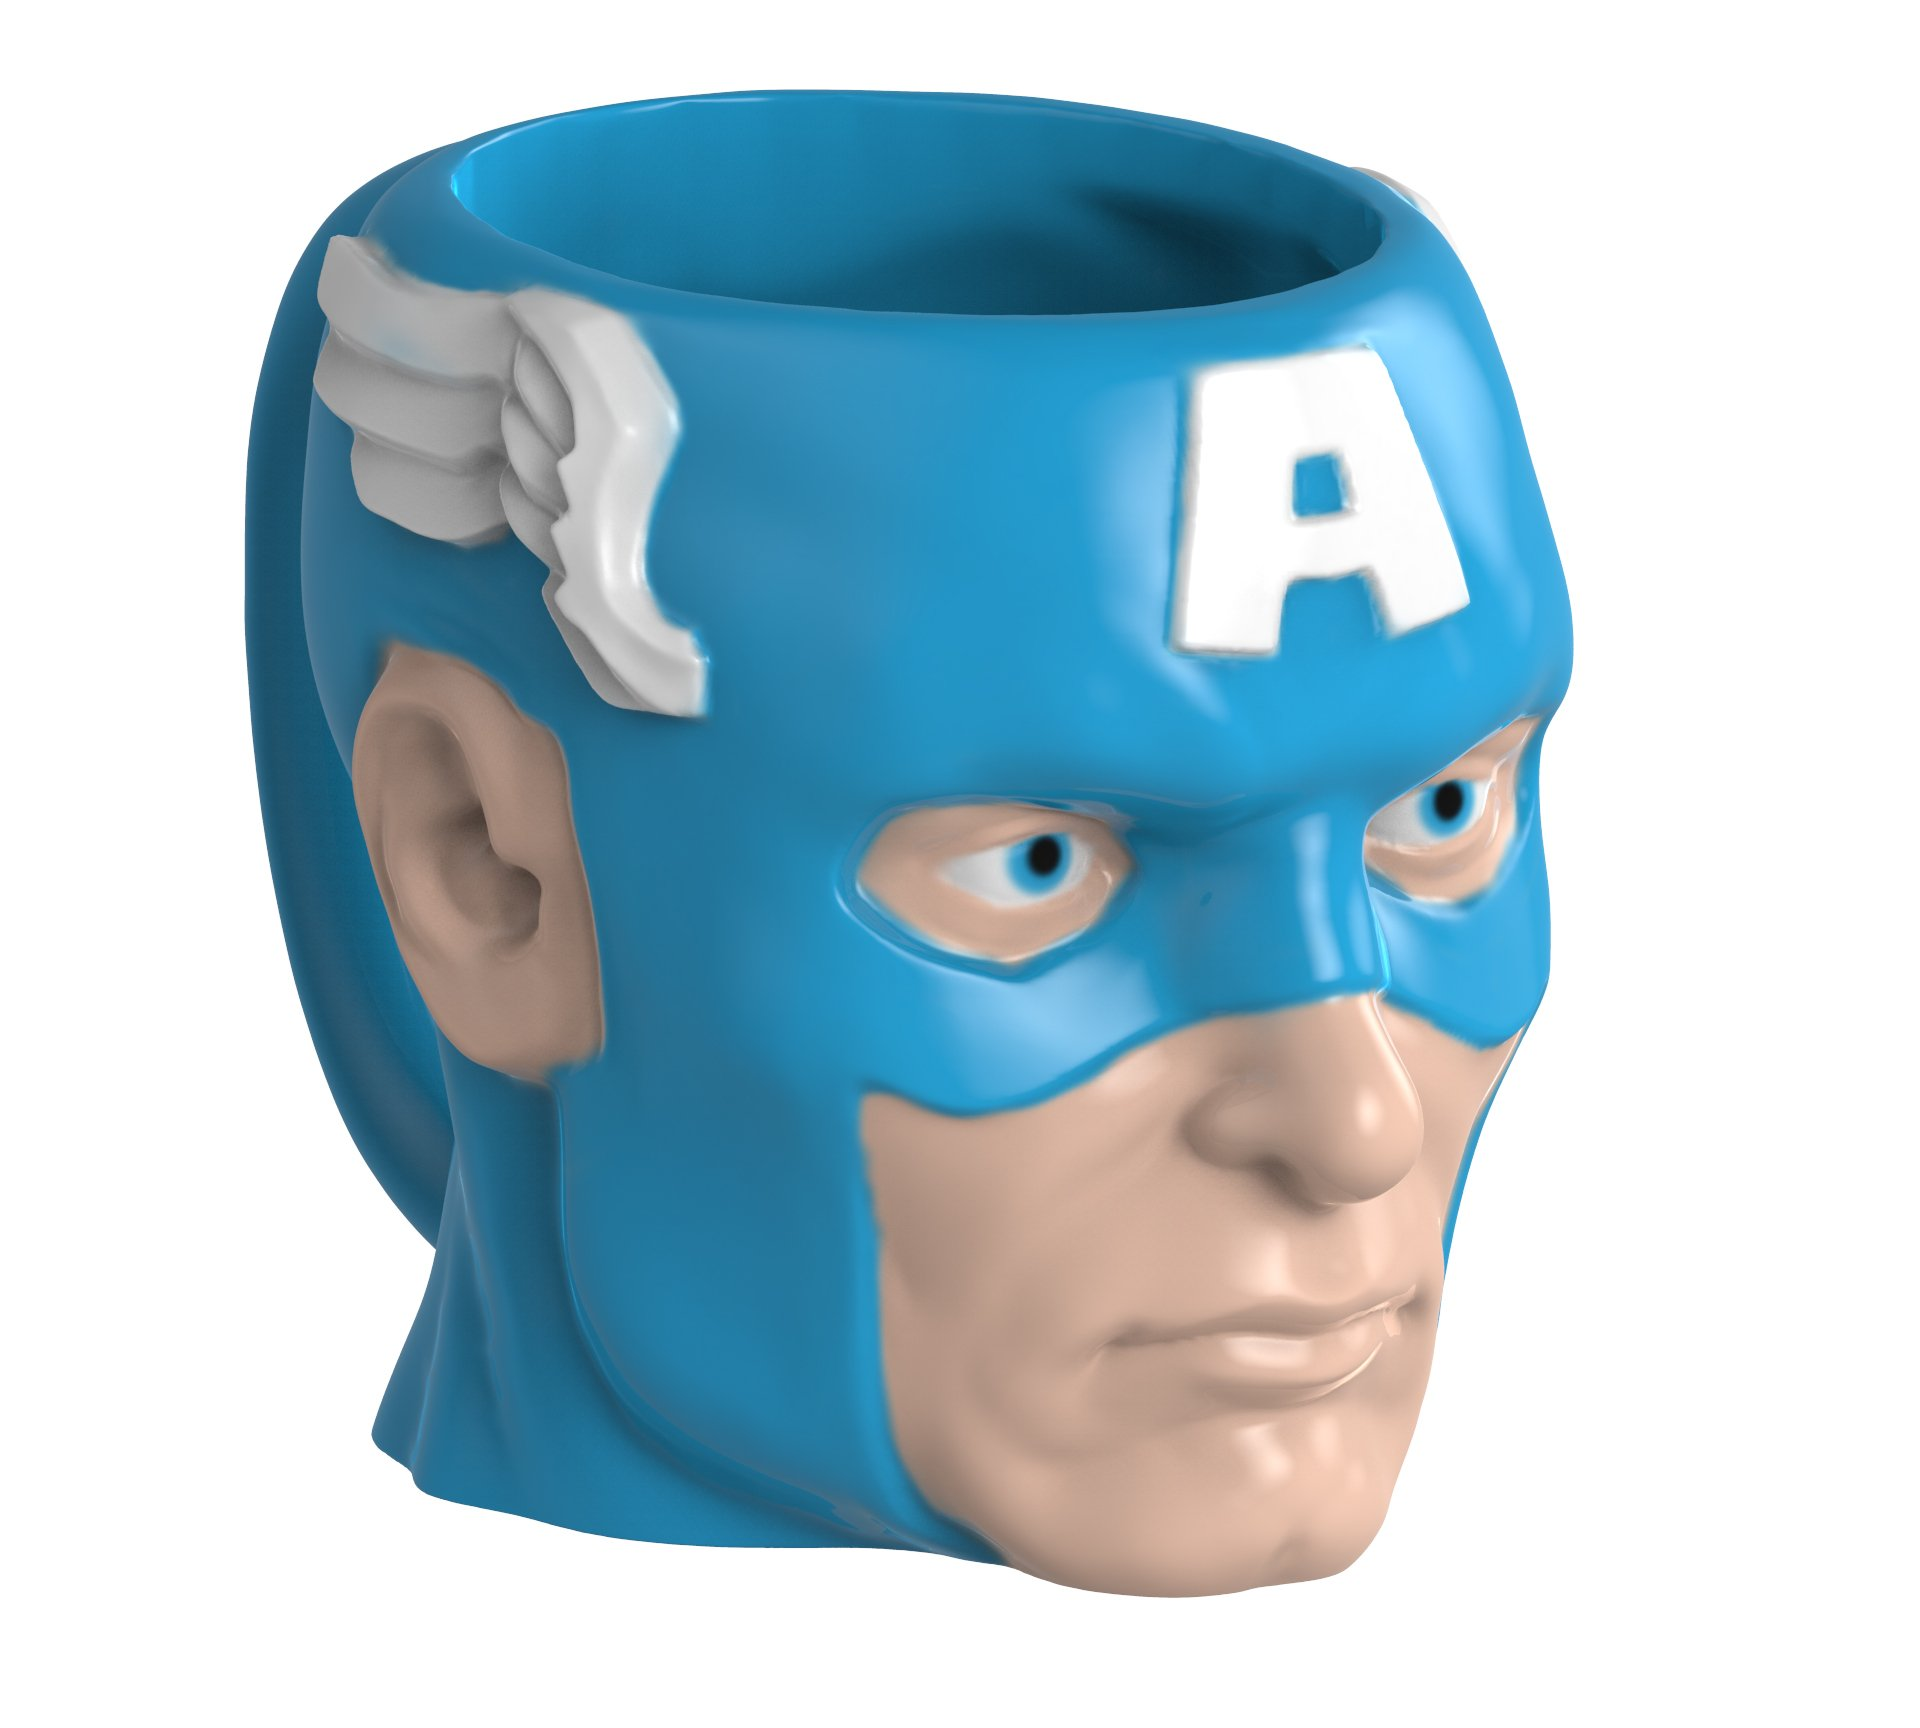 Zak Designs MRTI-8513 Marvel Comics Sculpted Ceramic Coffee Cup, Captain America by Zak Designs (Image #2)